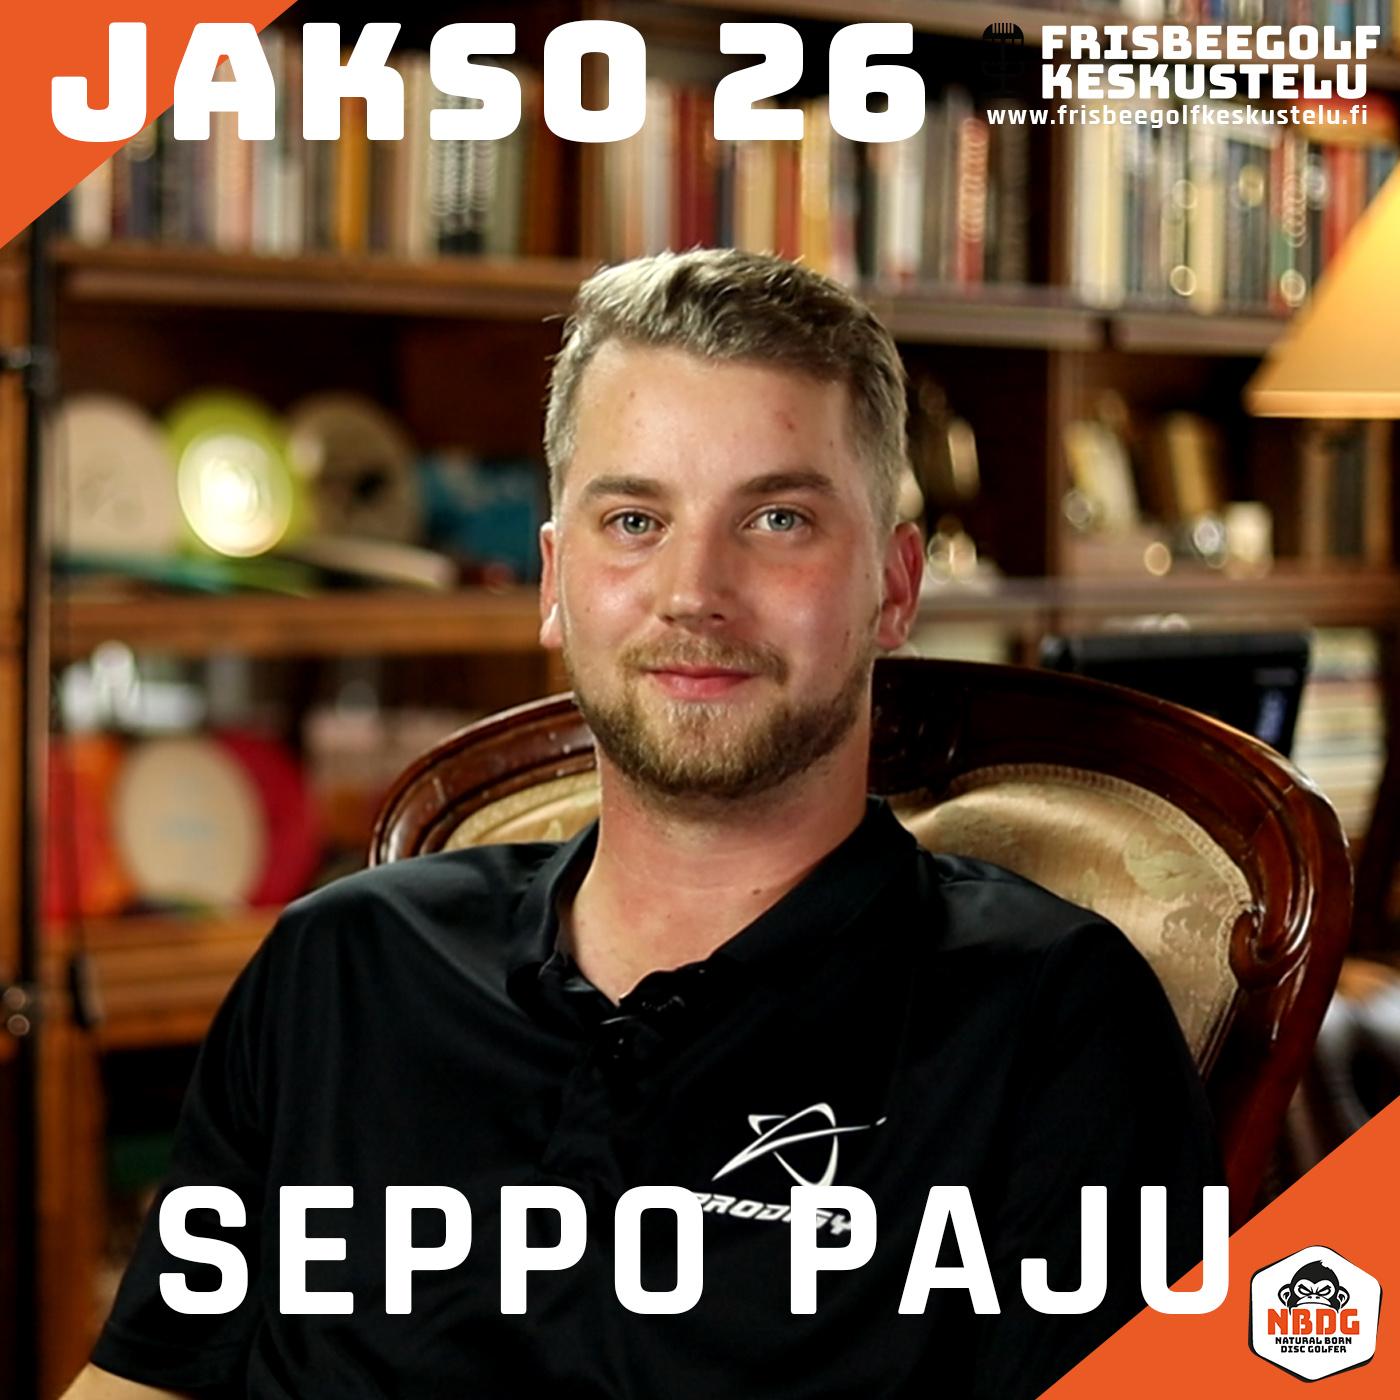 Frisbeegolfkeskustelu jakso #26 - vieraana Seppo Paju